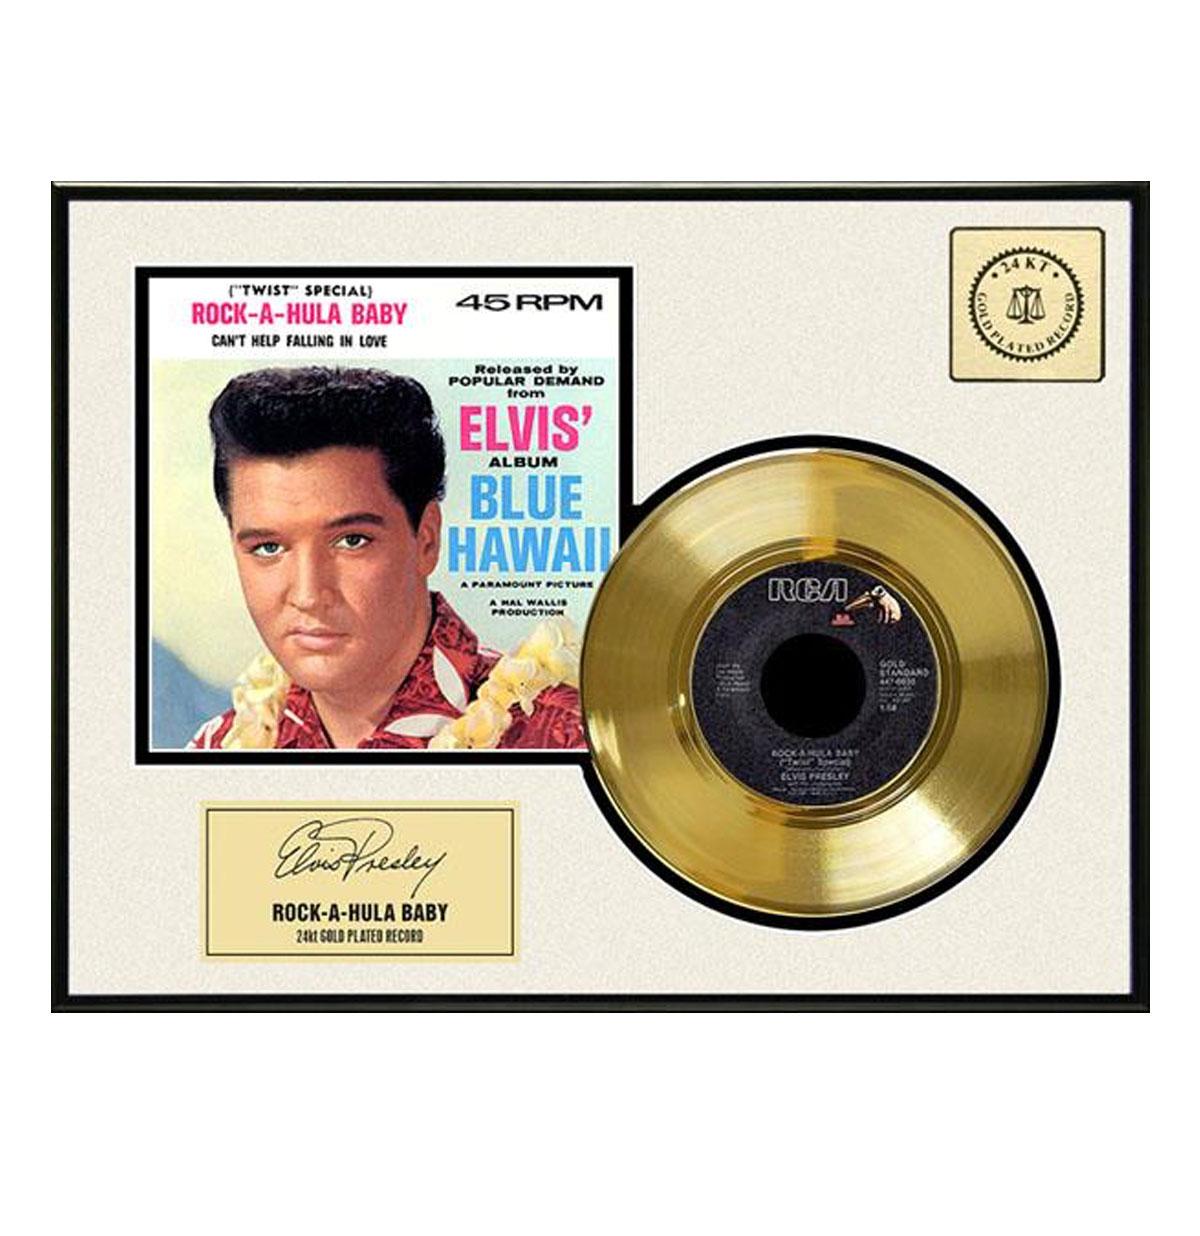 Elvis Presley - Rock-A-Hula Baby Gouden Plaat (45RPM)